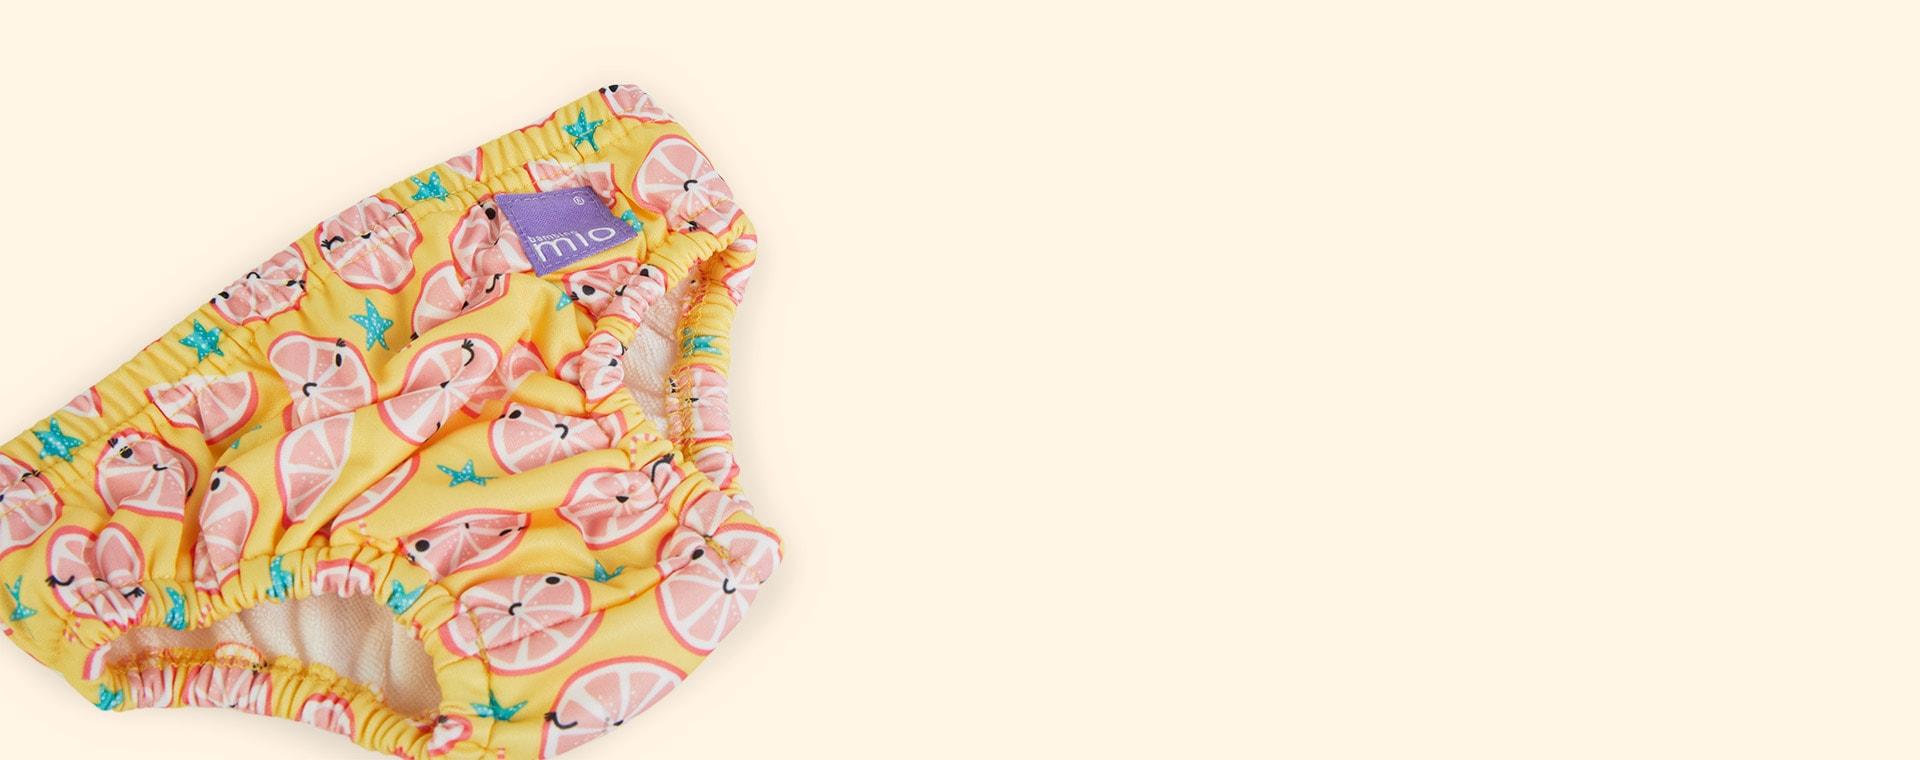 Cool Citrus Bambino Mio Reusable Swim Nappy